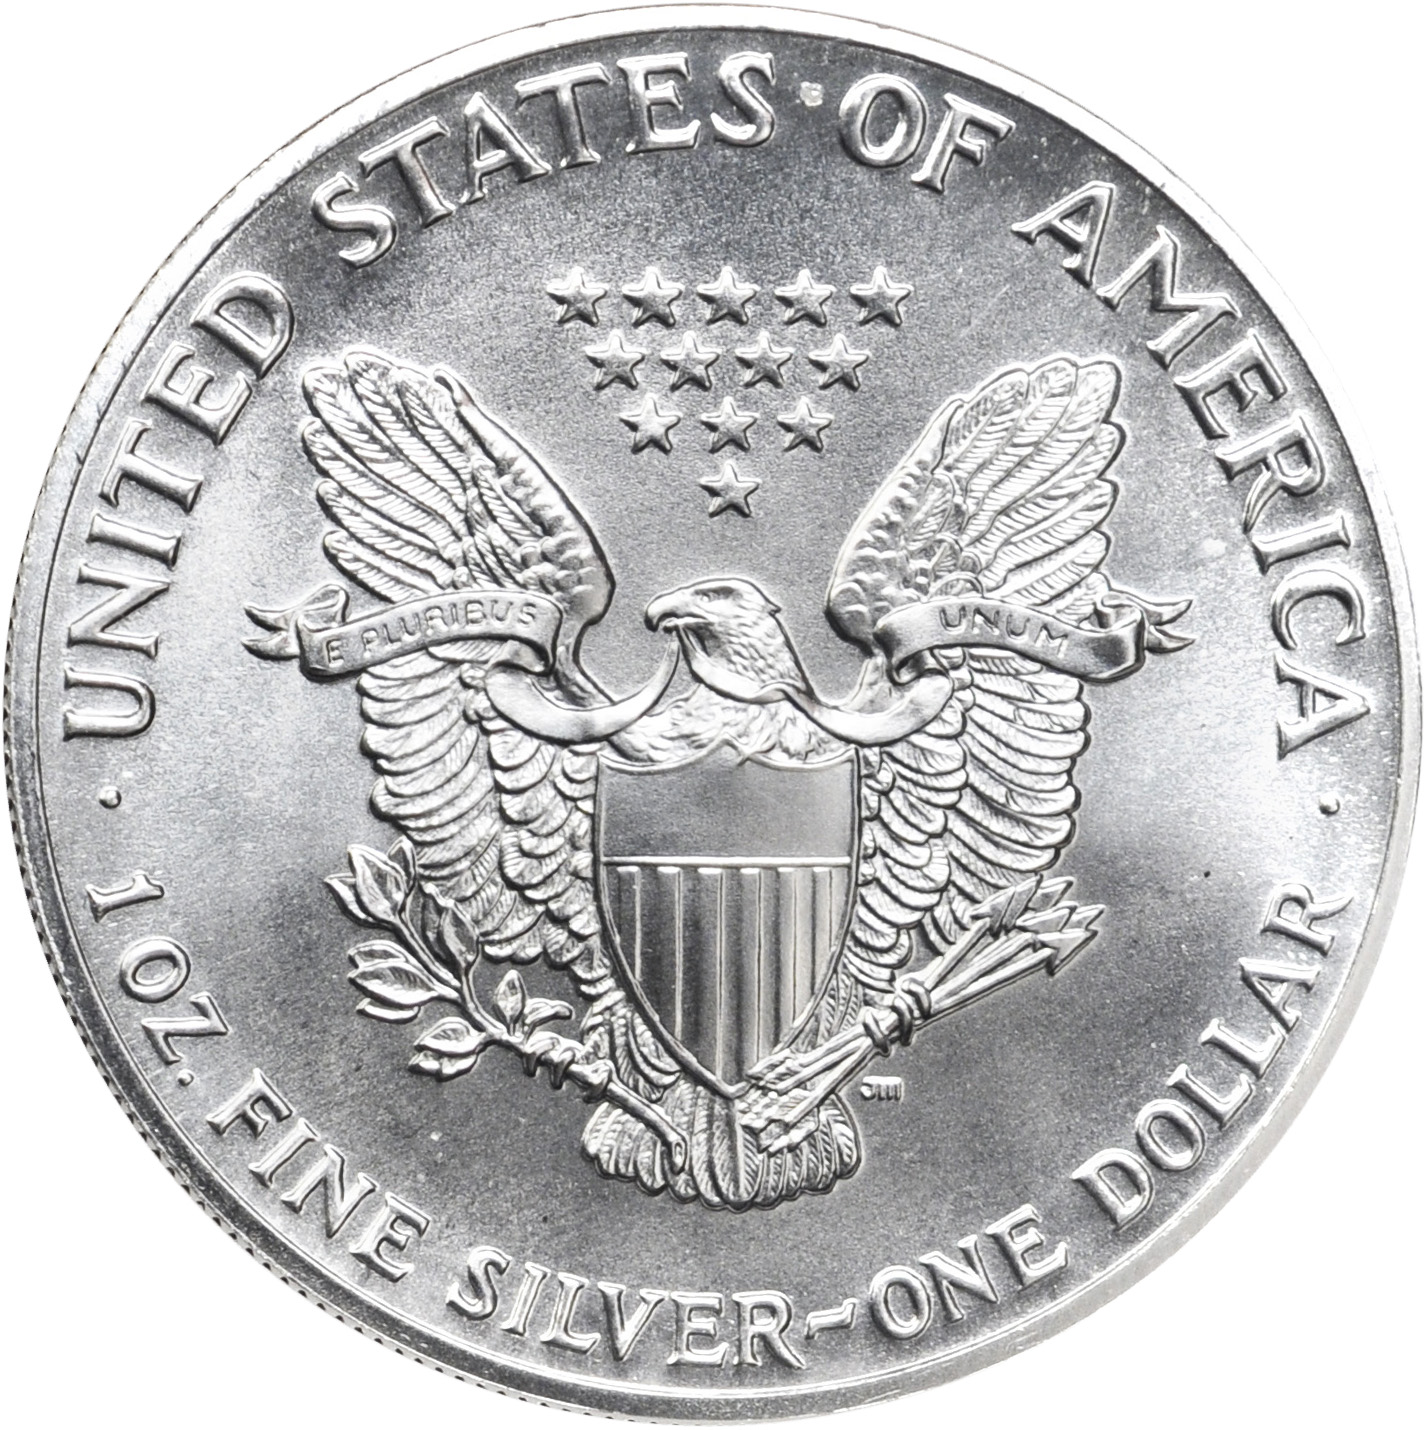 Value Of 1989 1 Silver Coin American Silver Eagle Coin